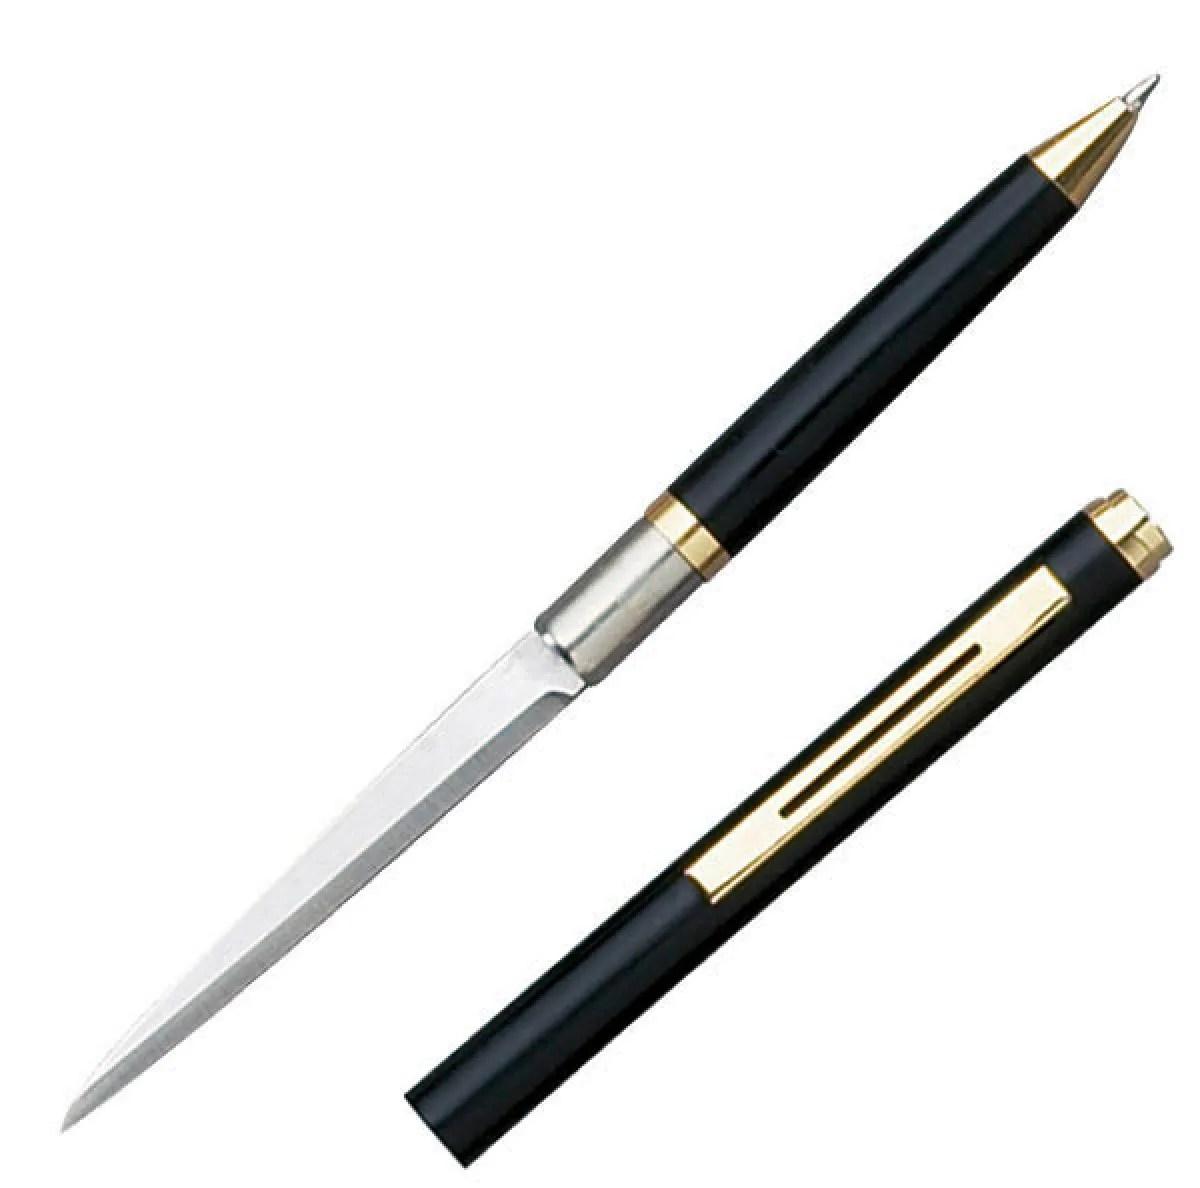 Best women's self-defense tools - Pen knife